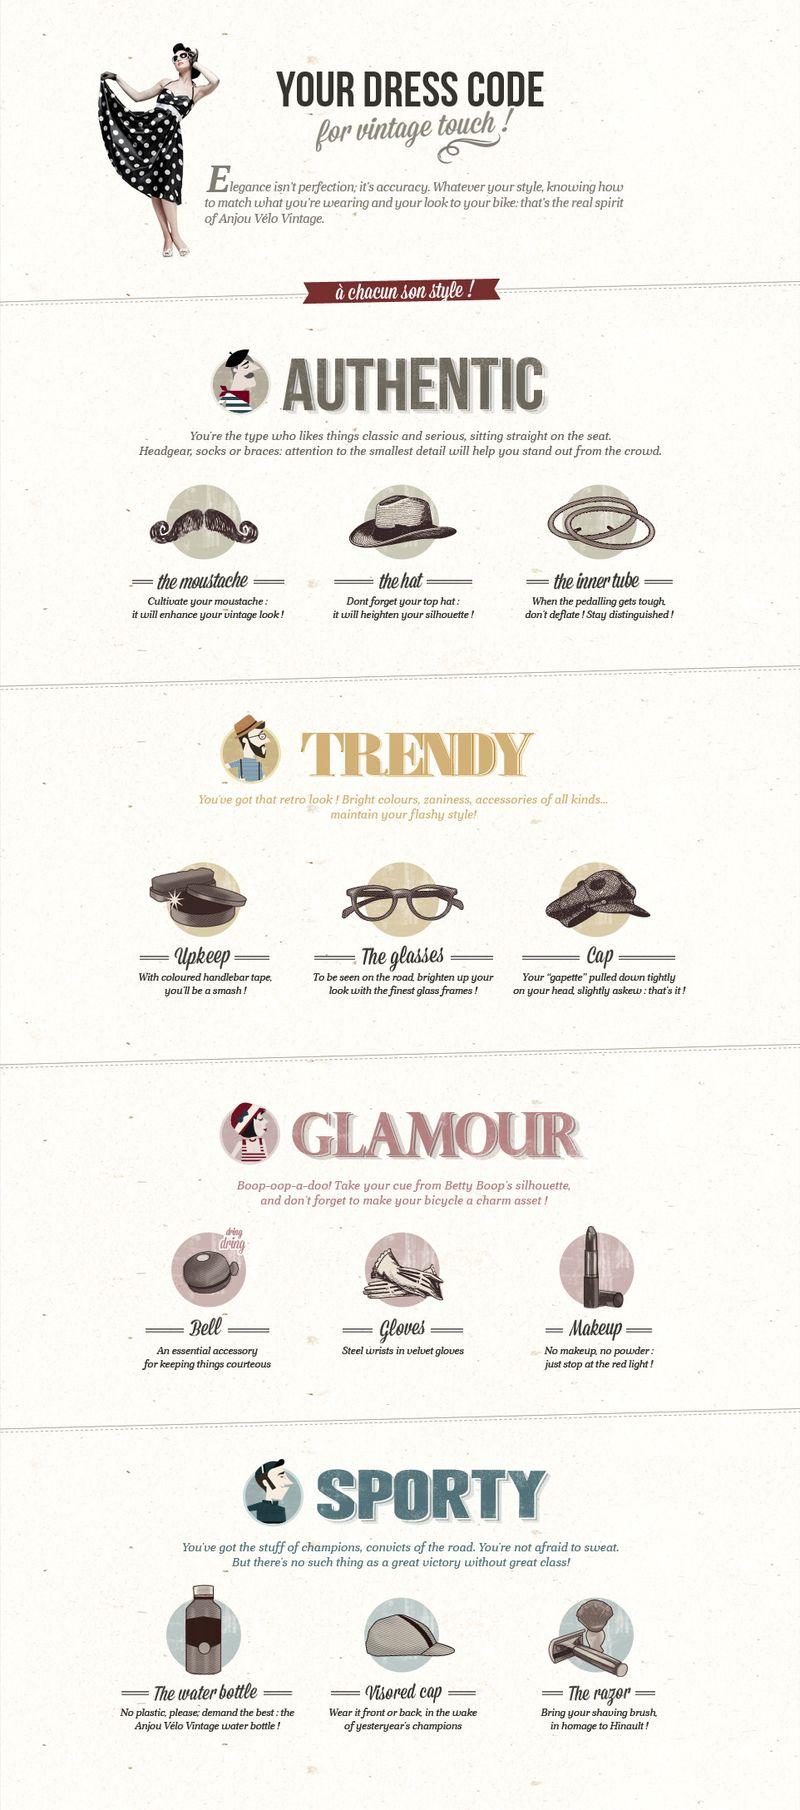 Vintage Dress Code Infographic